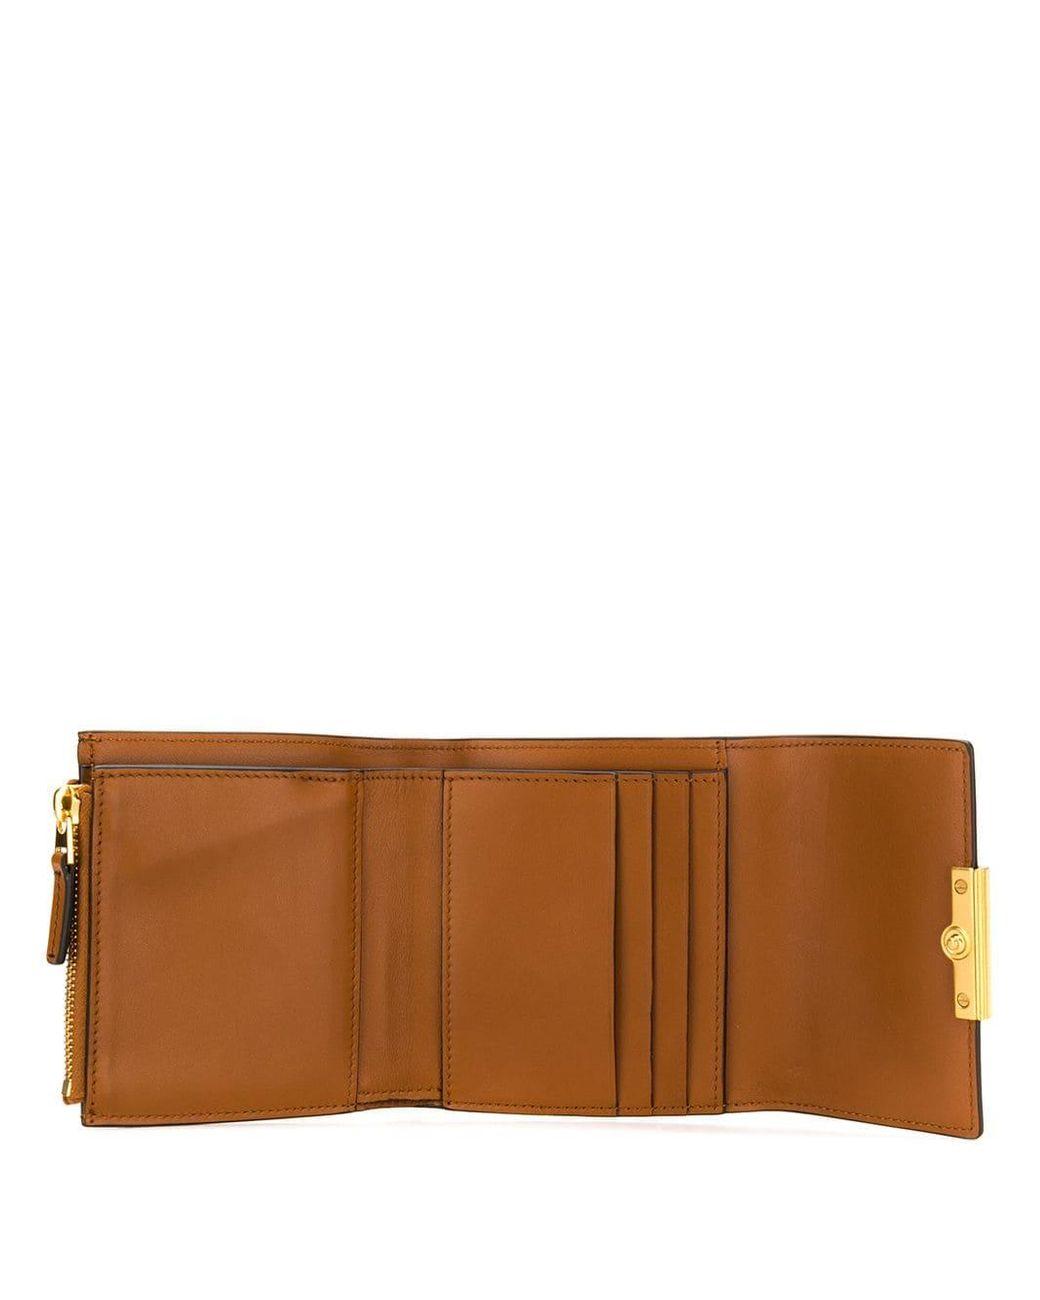 Tommy HILFIGER Smooth Leather Zip Around Portafoglio Wallet Cognac Marrone Nuovo